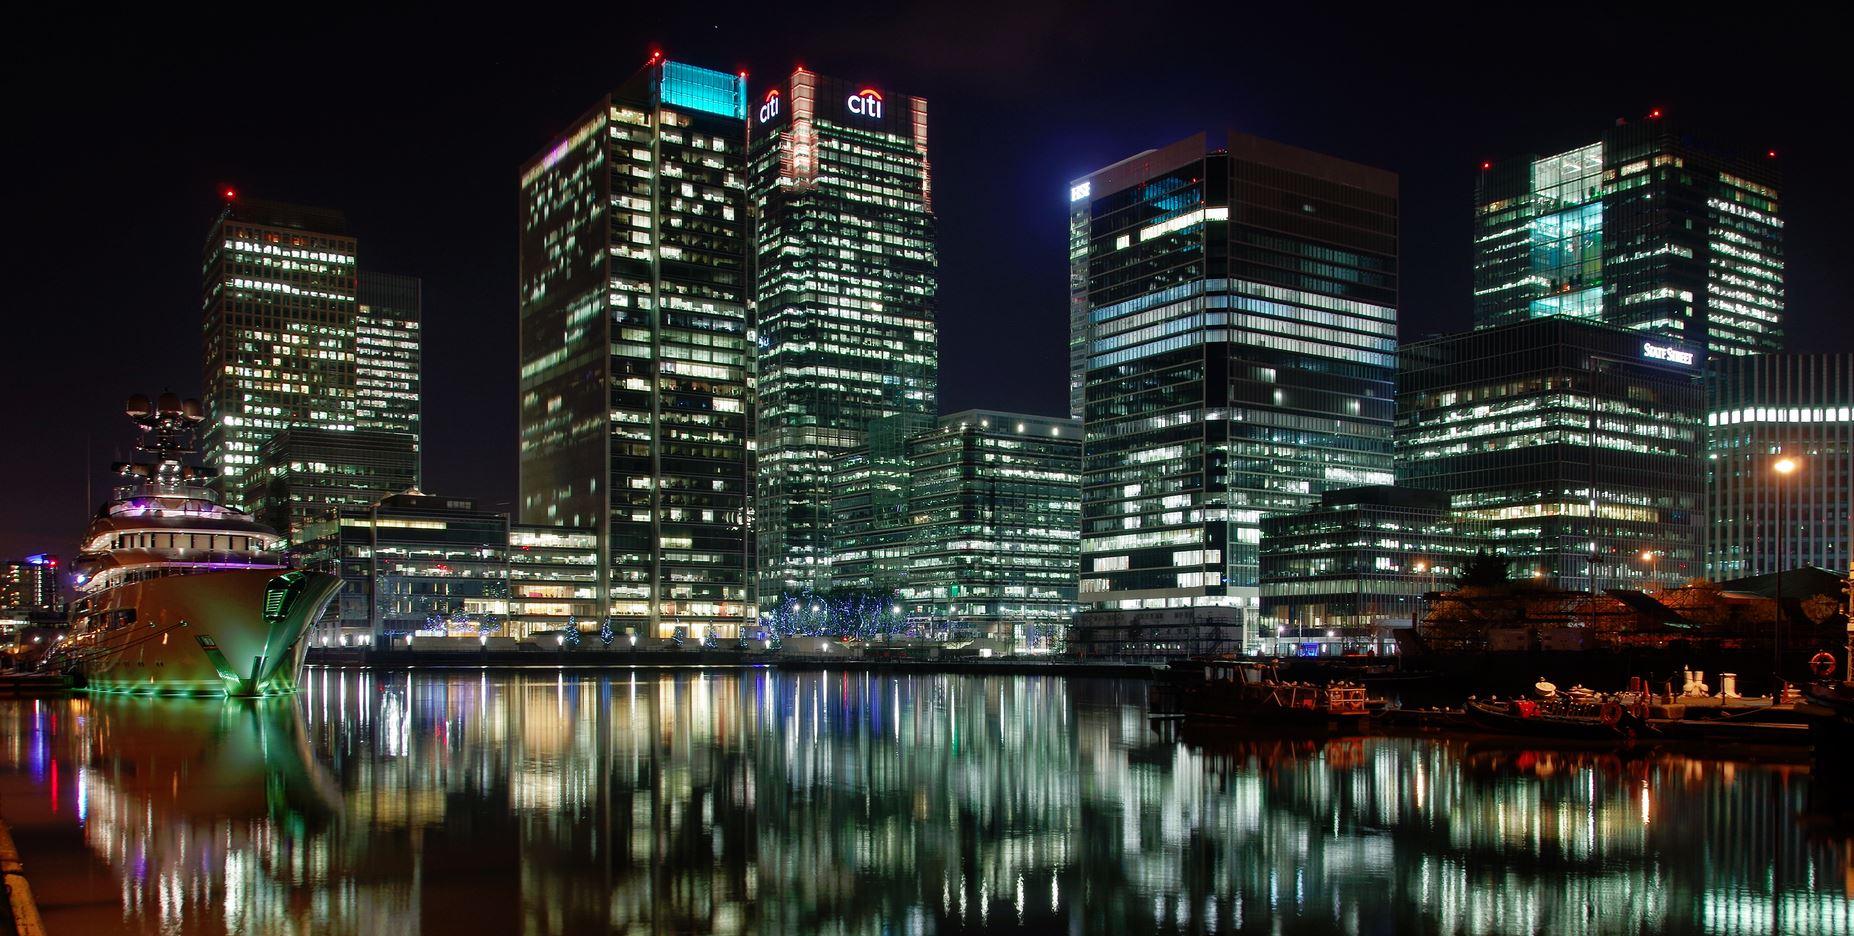 Productivity Problem - Canary Wharf